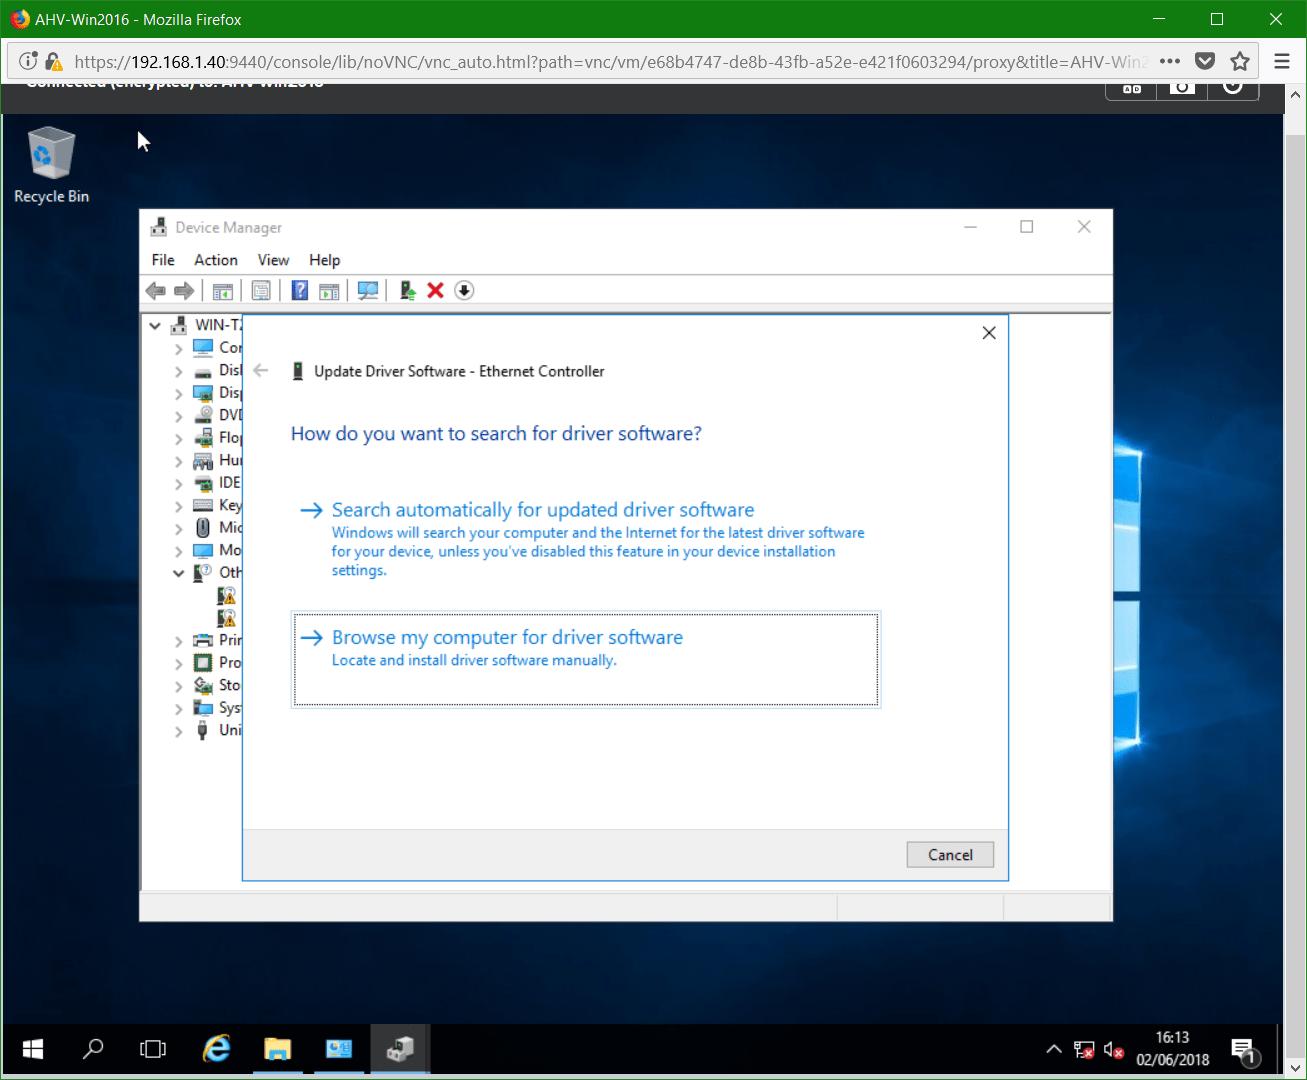 domalab.com Nutanix Windows AHV browse drivers